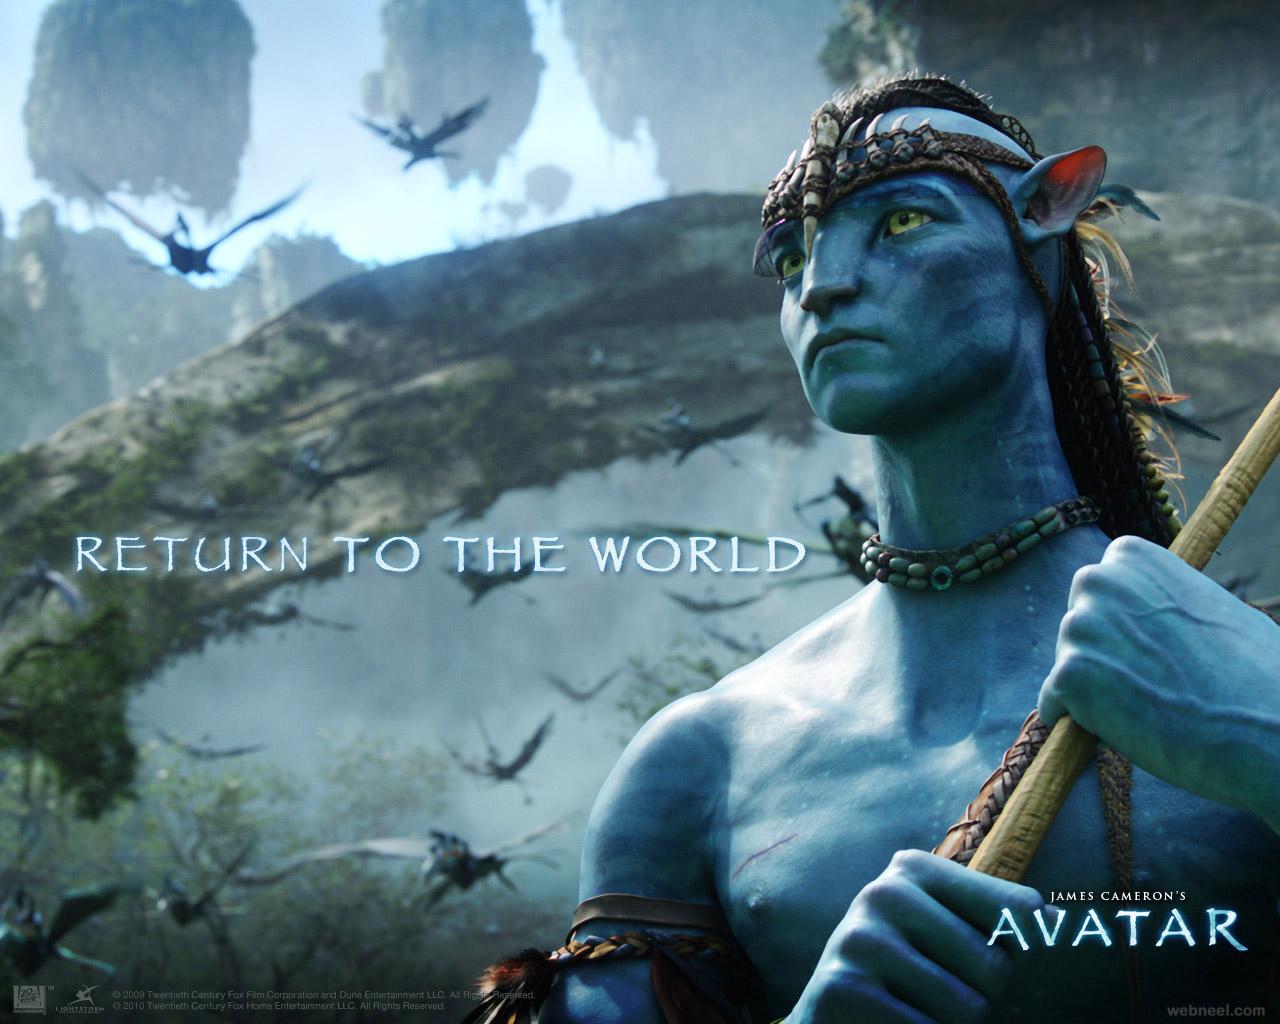 avatar animation movie wallpaper 10 - full image